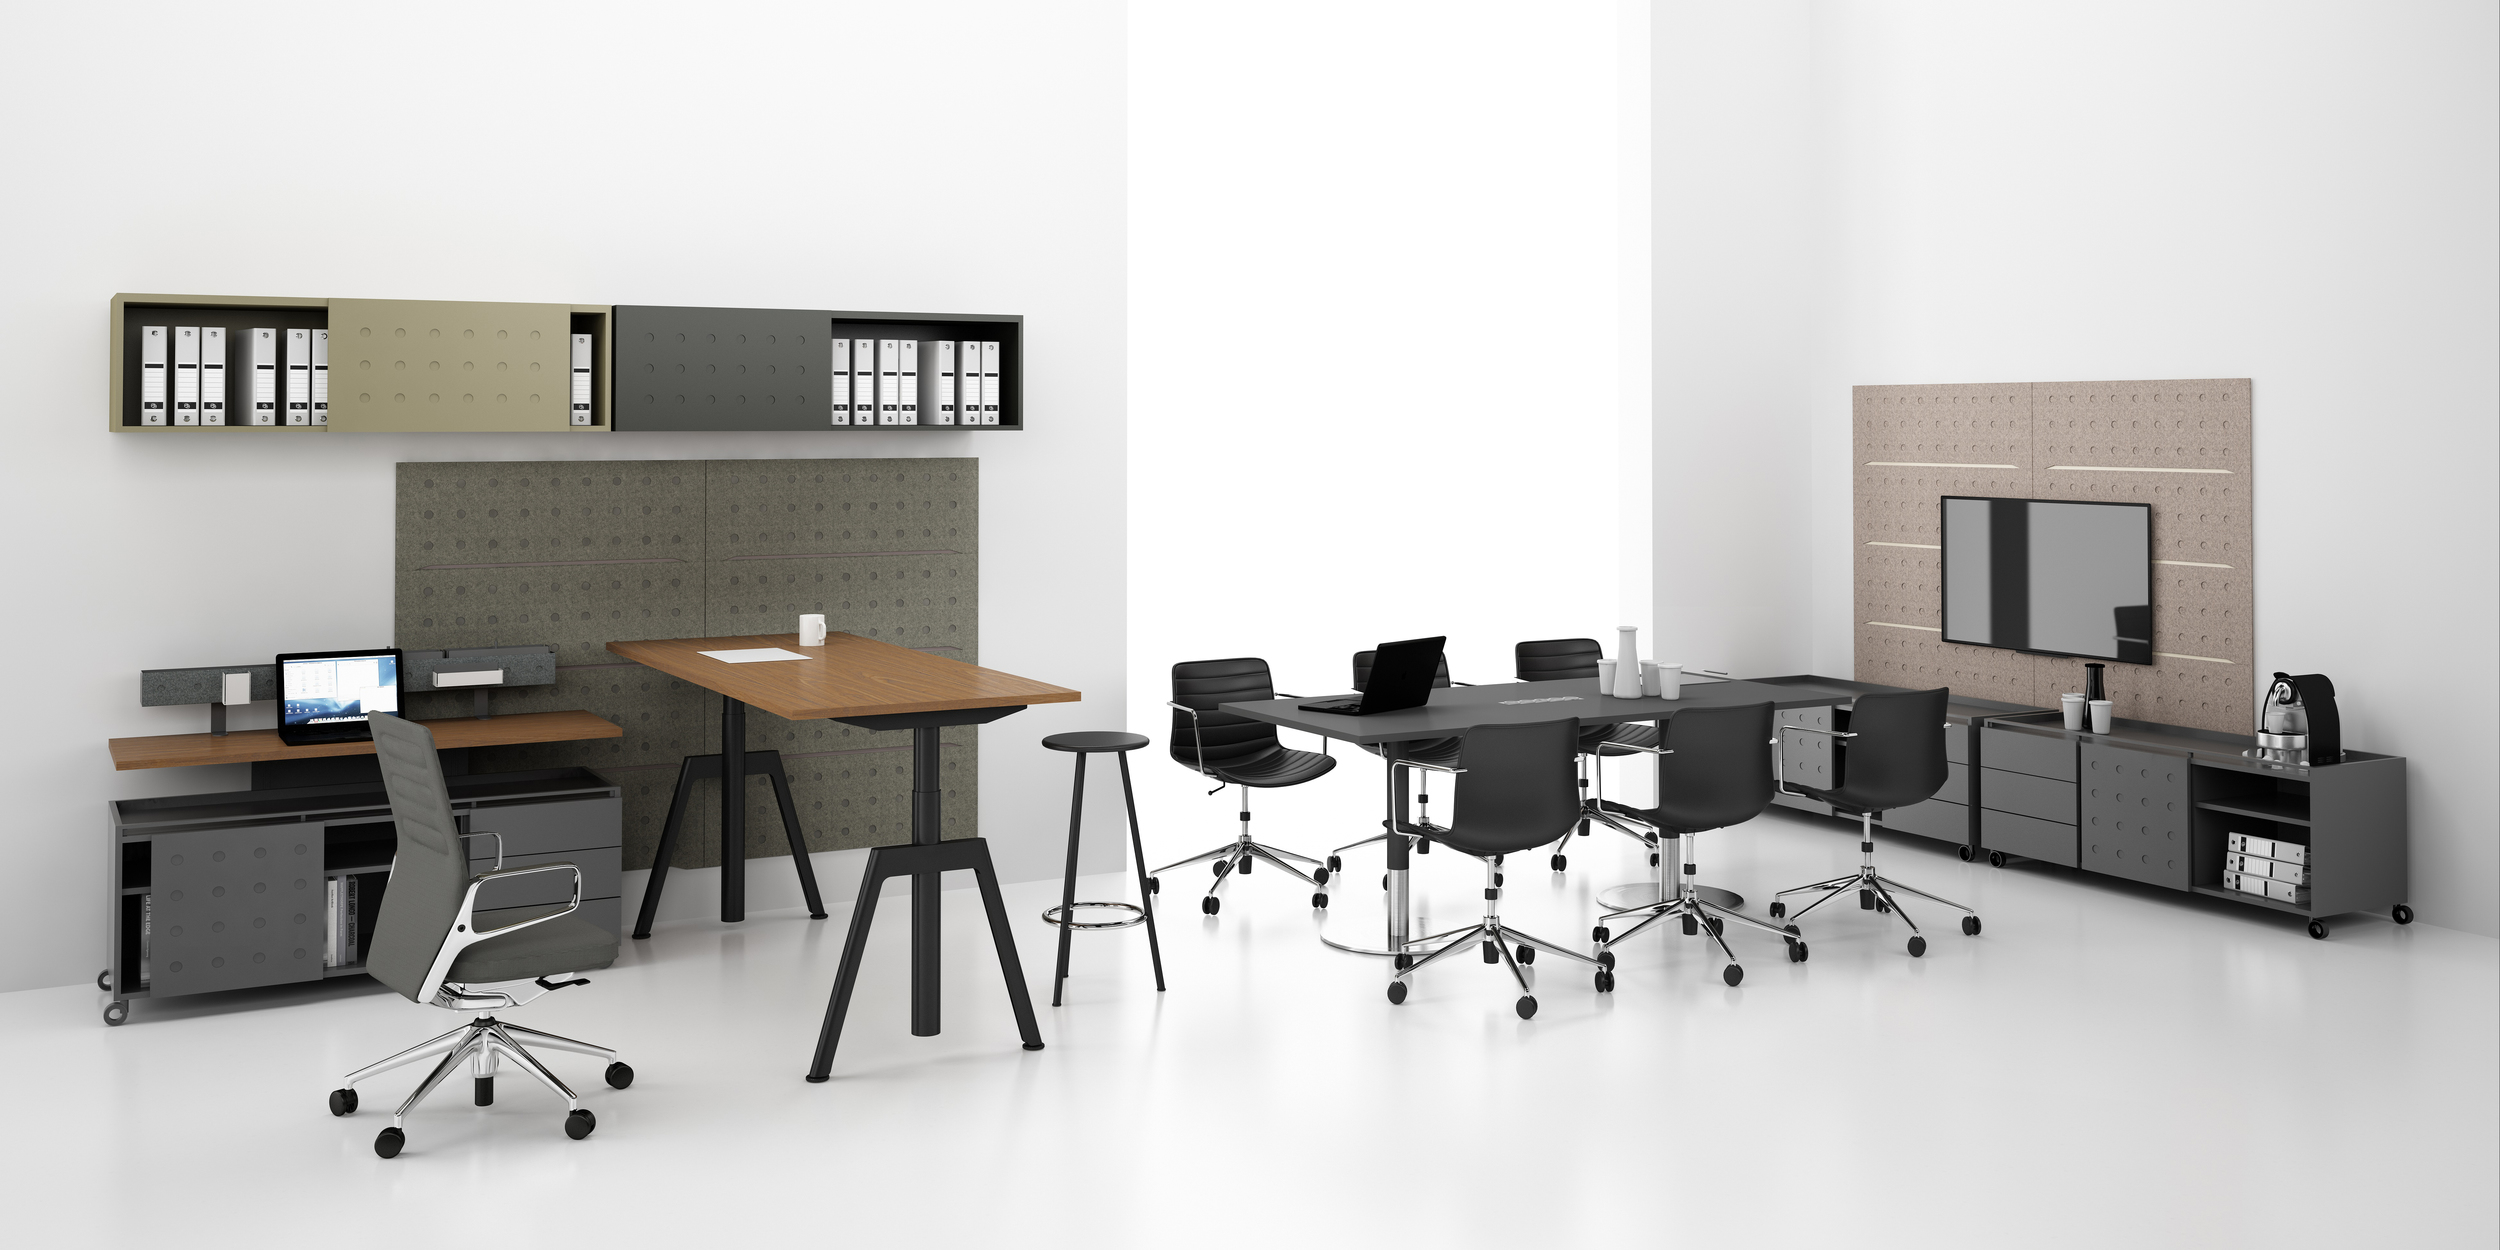 Wizualizacje Biurowe Designova (3).jpg